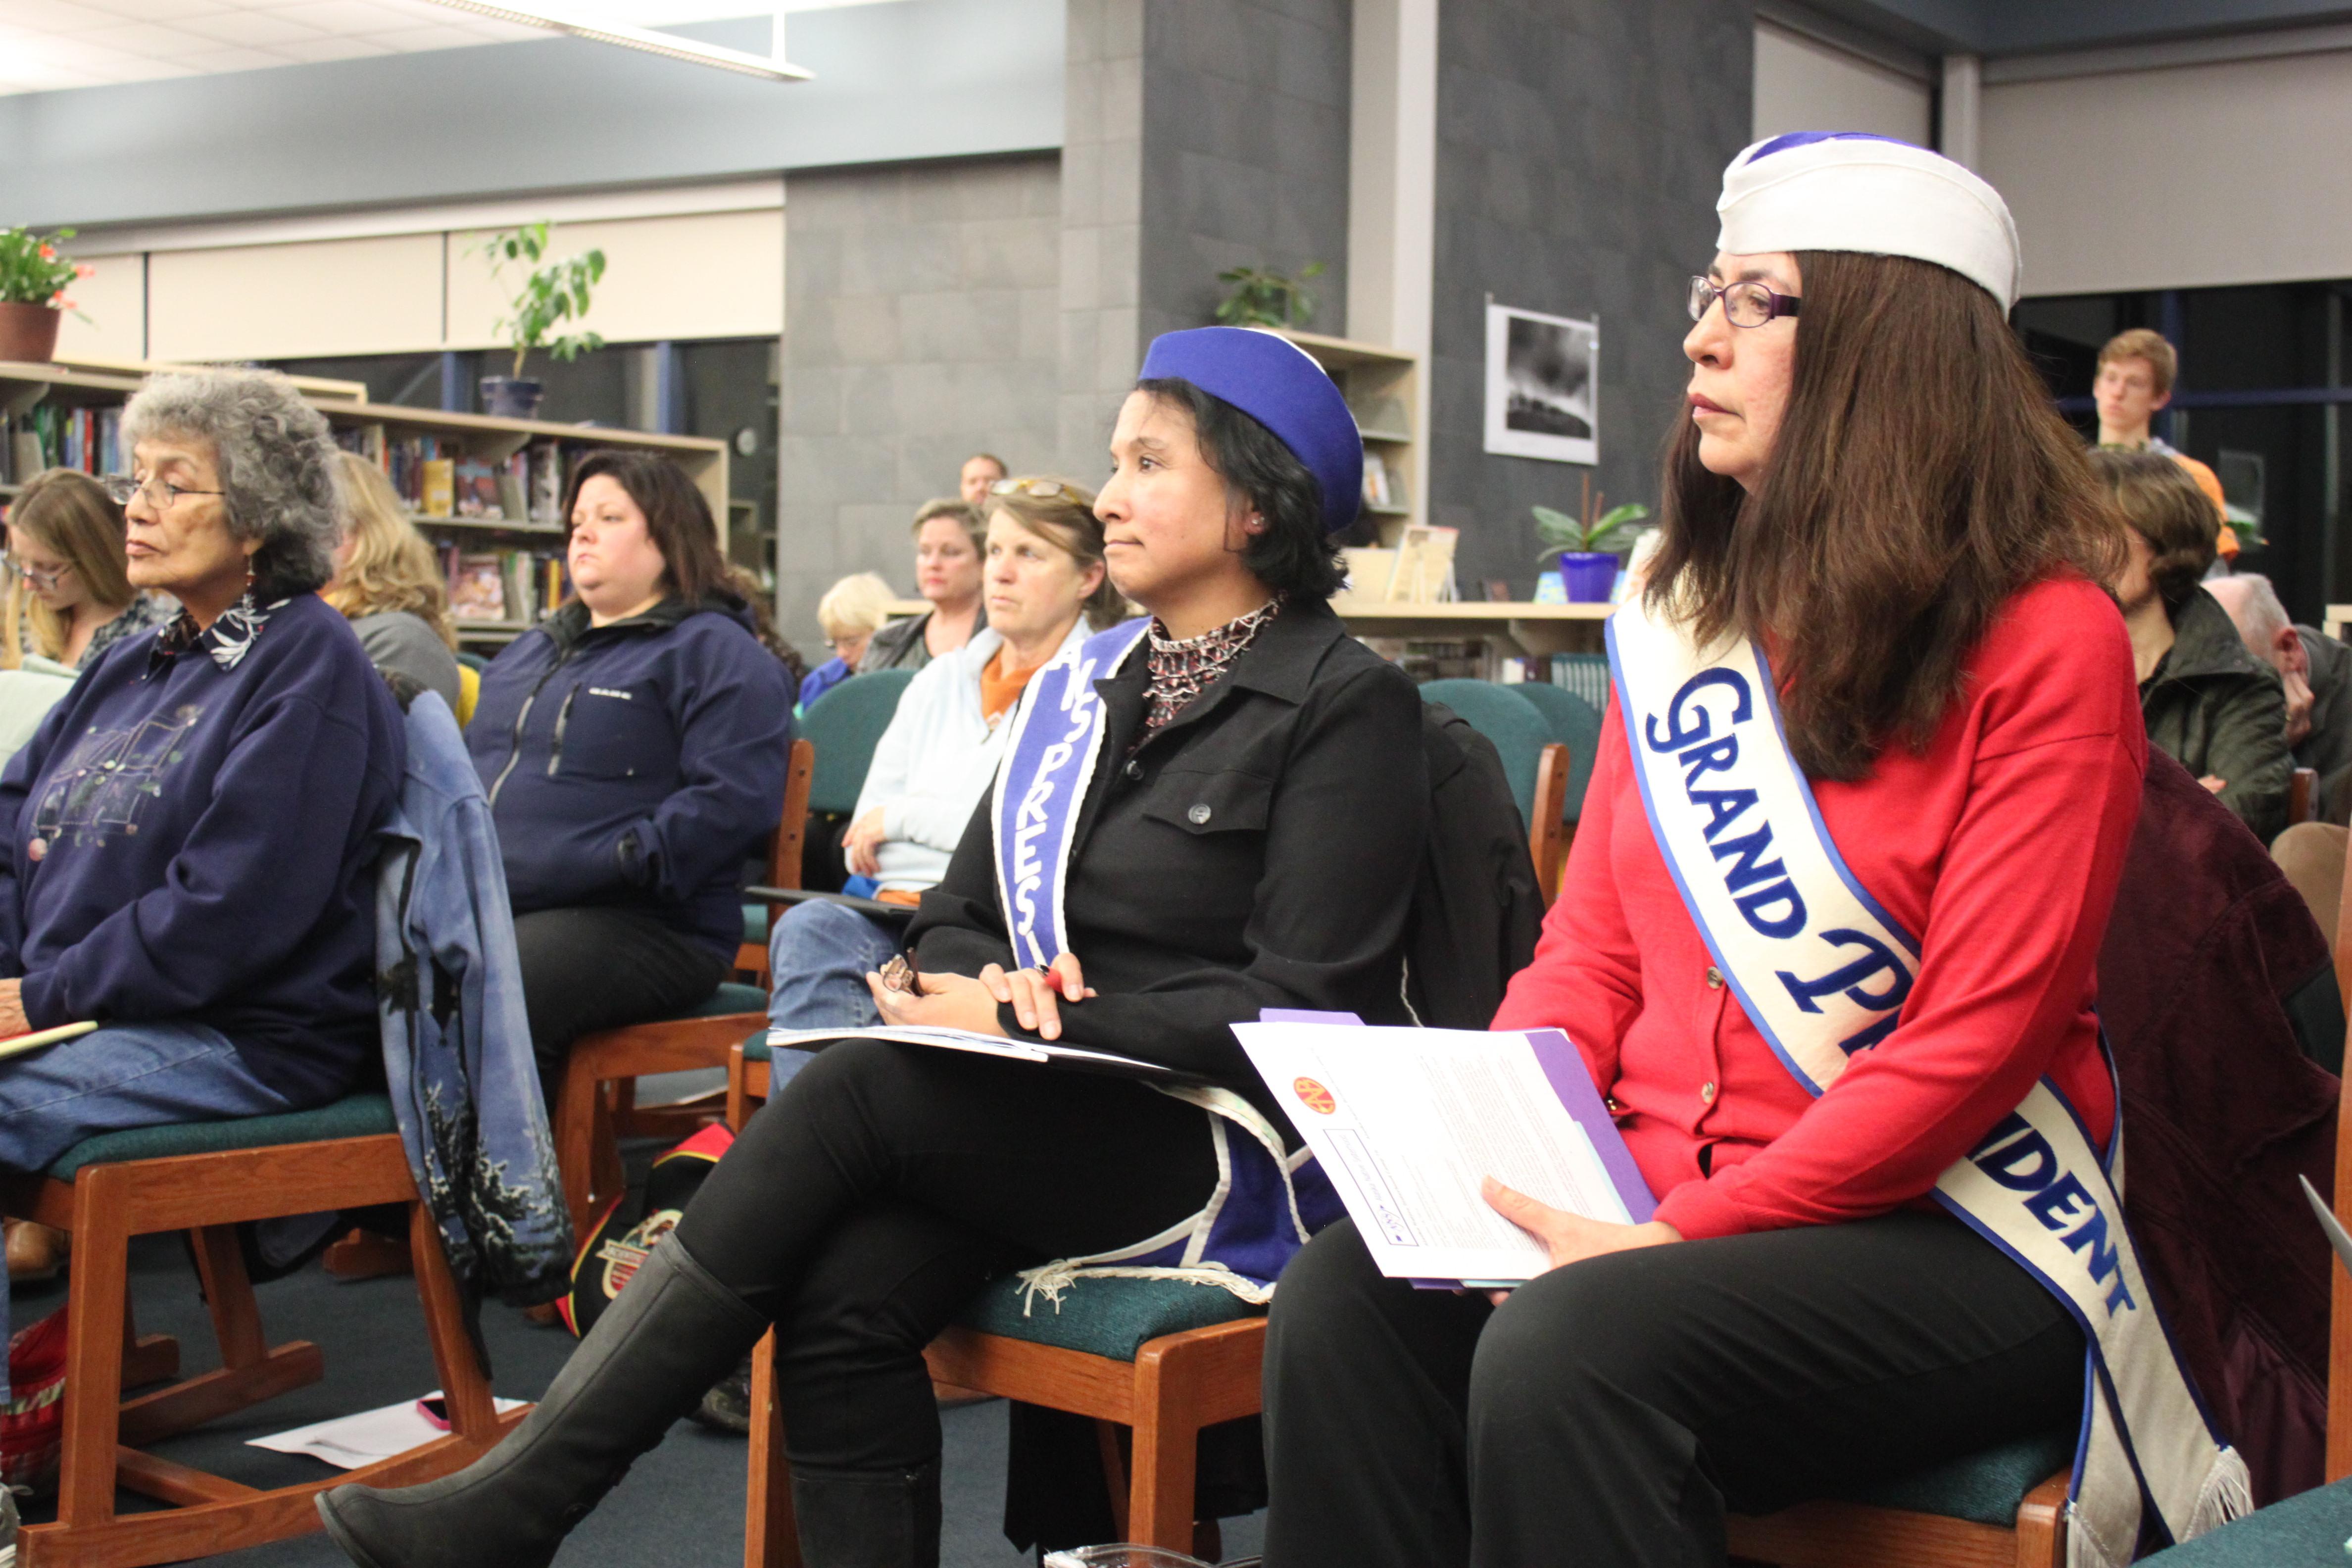 Freda Westman, right, at a school board meeting in November 2014. (Photo by Lisa Phu/KTOO)